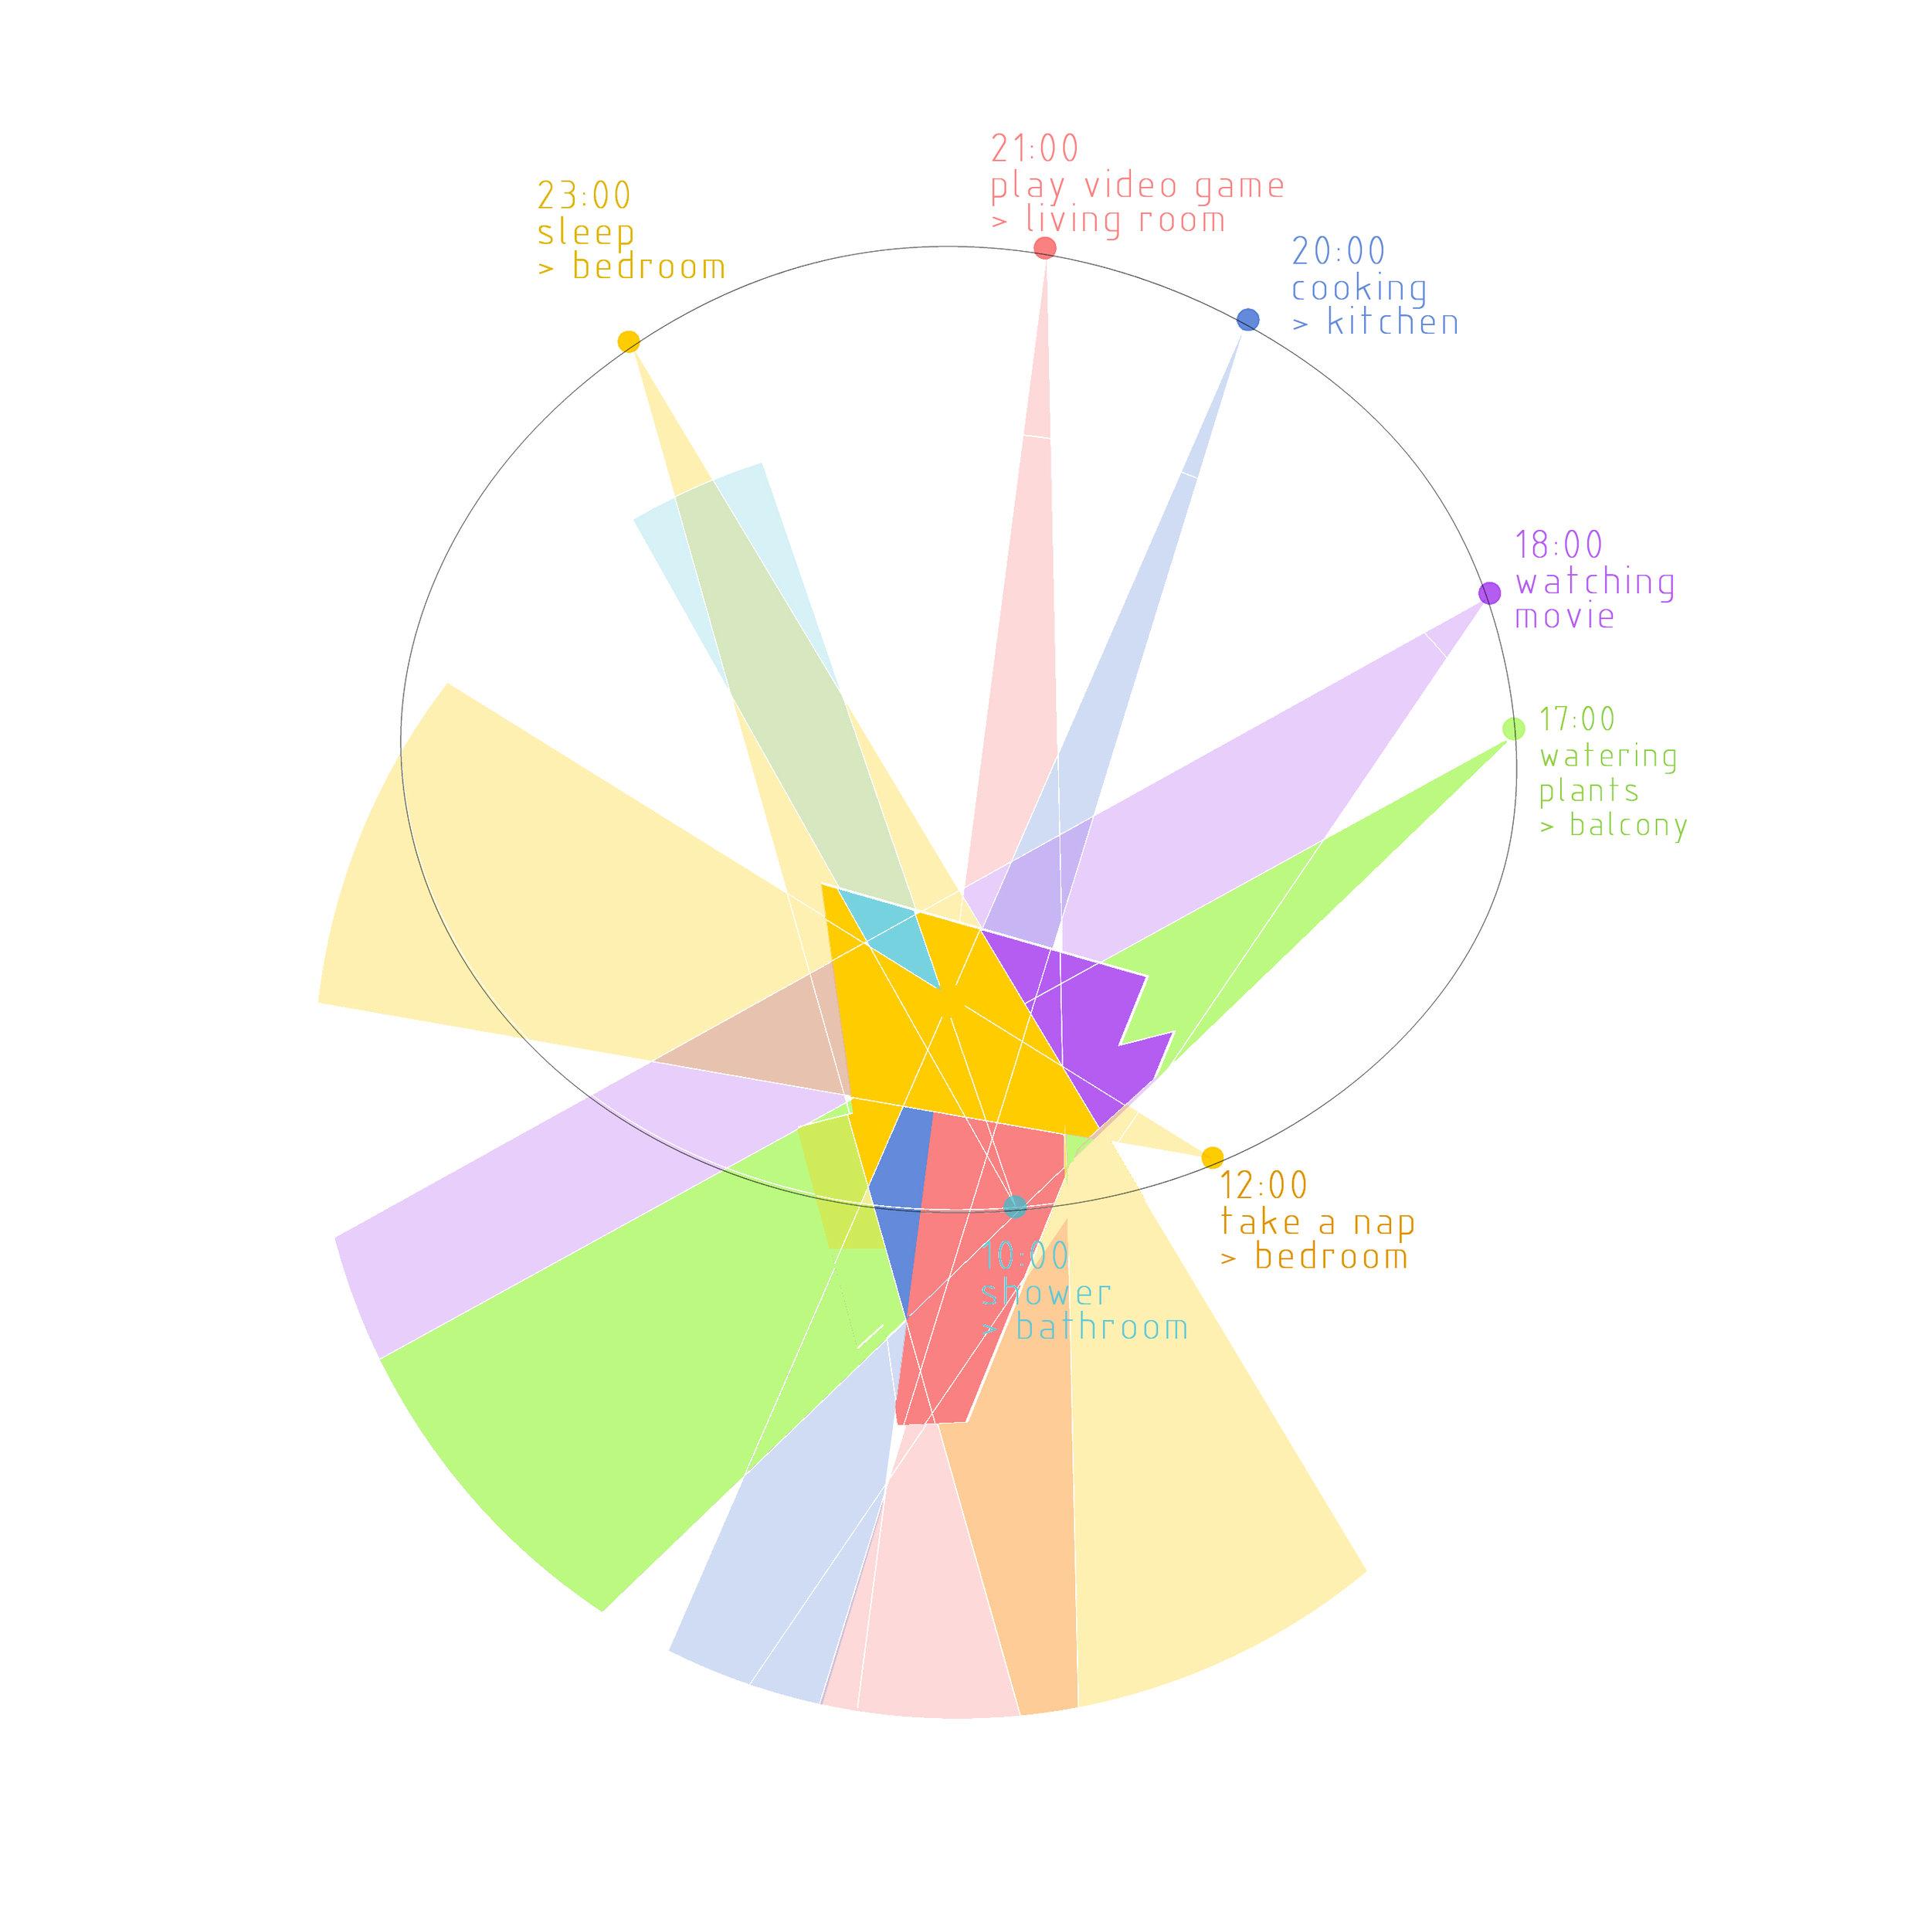 SparanoMooneyArchitecture_PulsarHouse_Diagram2.jpg